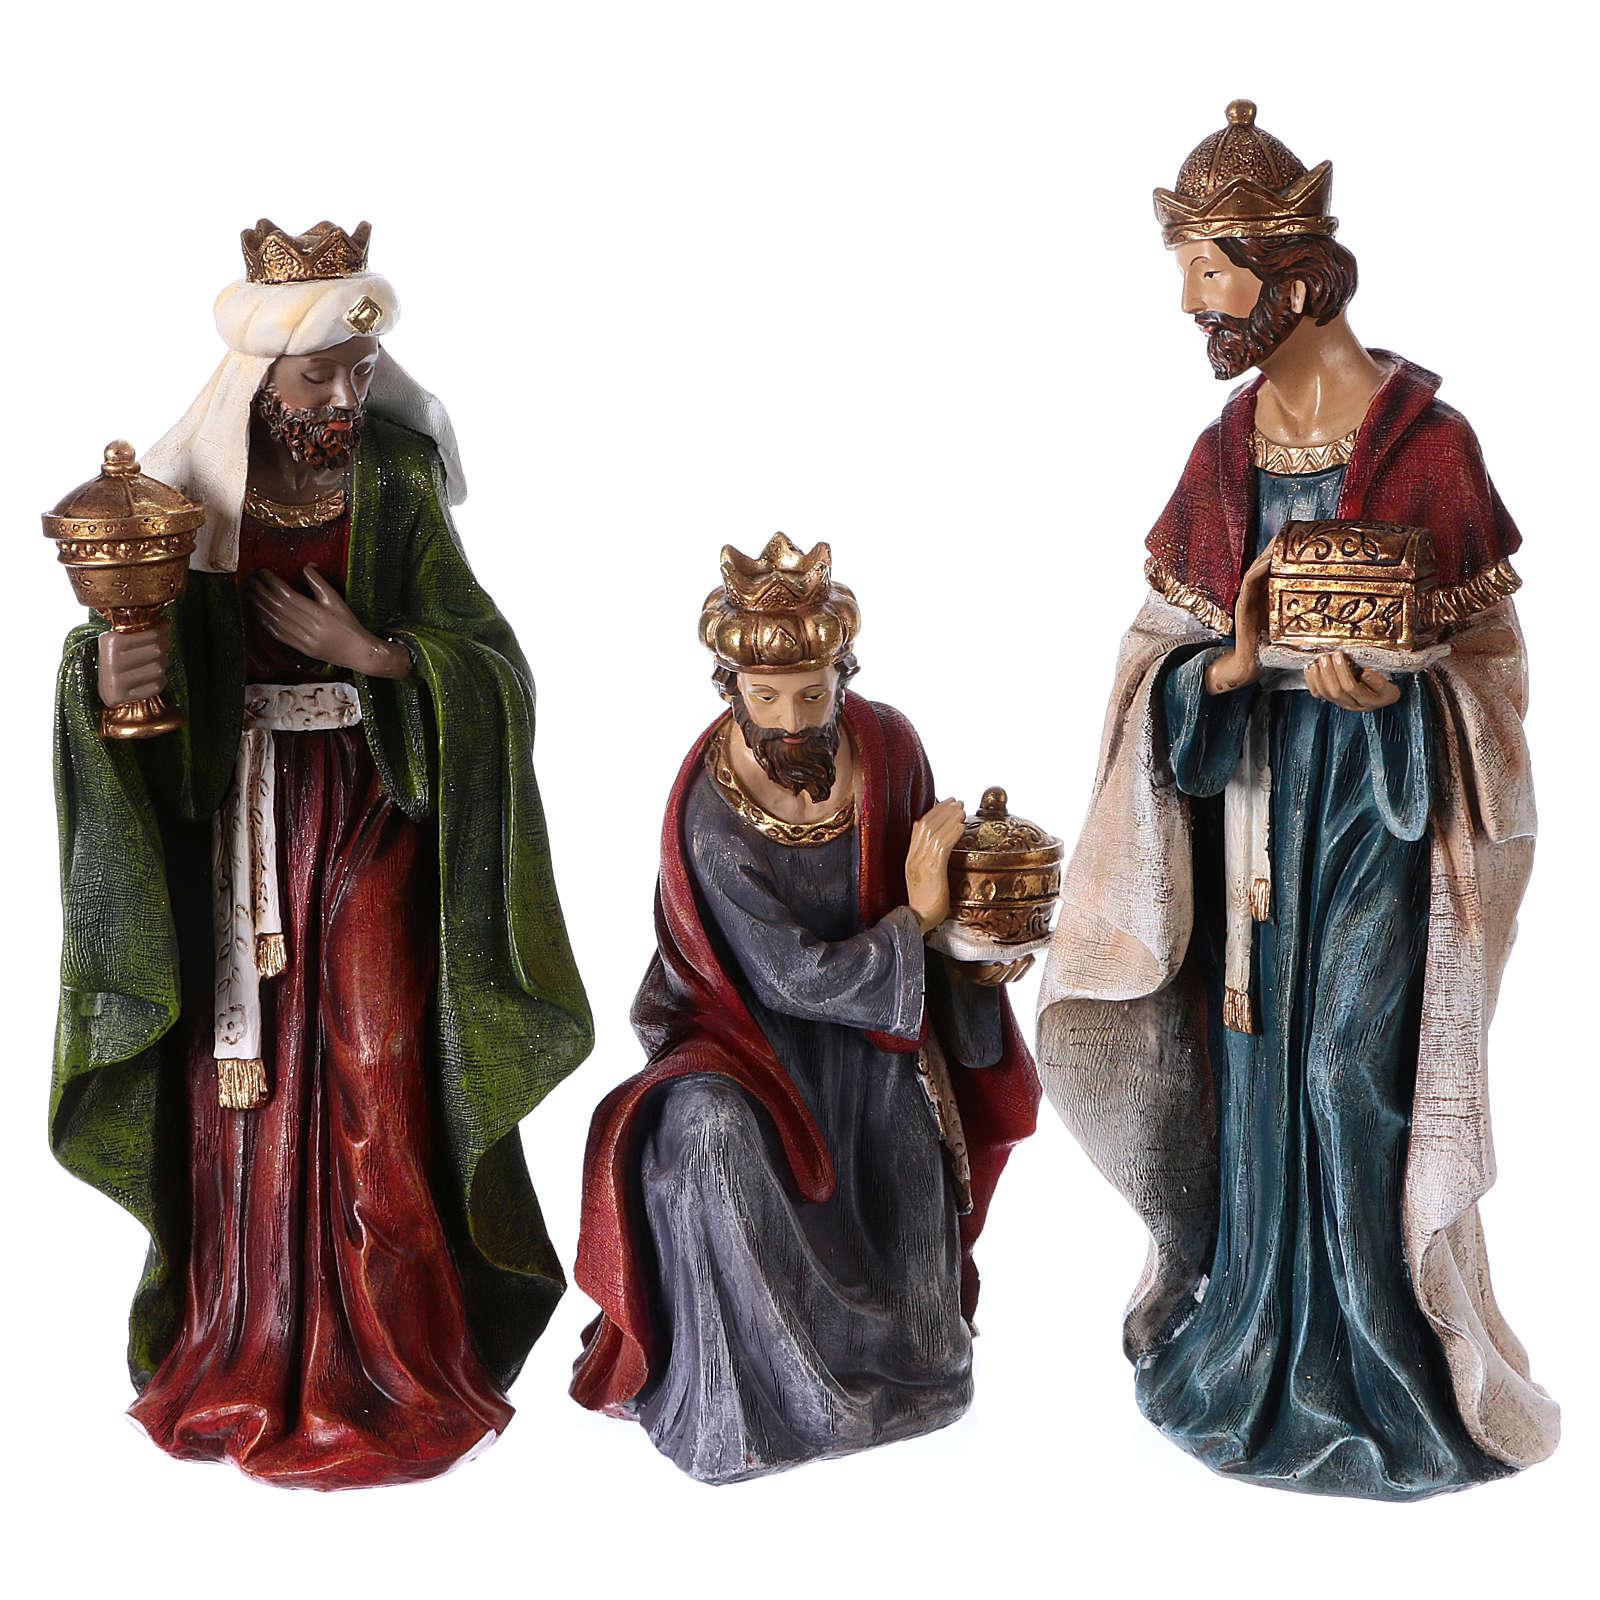 Multicolored Nativity Scene 32 cm, set of 8 figurines 4